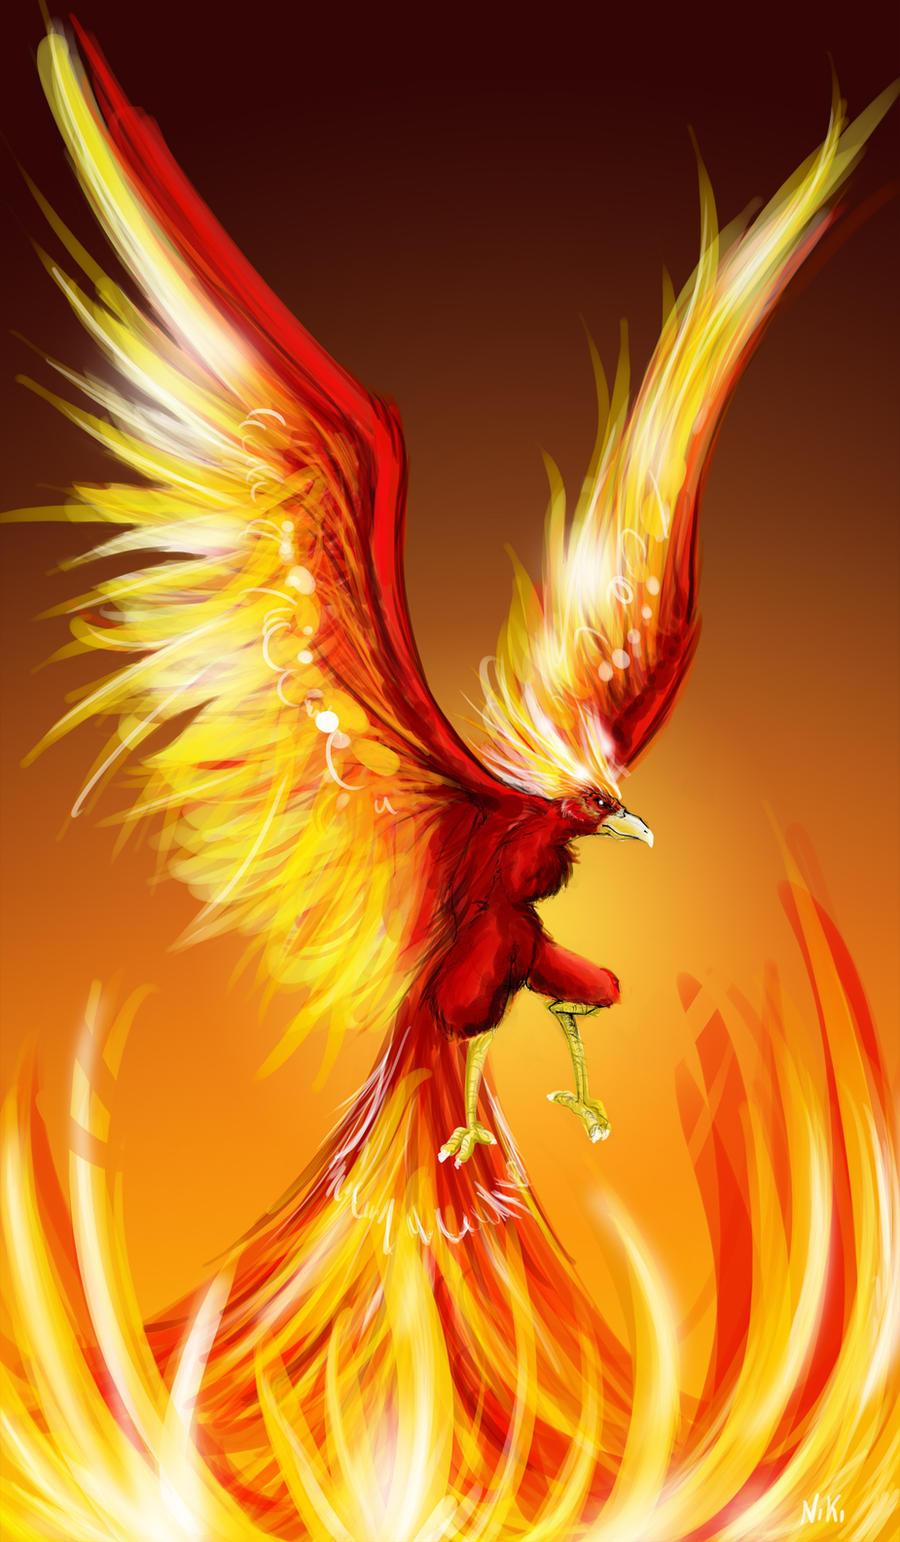 Phoenix on Pinterest | Phoenix Tattoos, Phoenix Rising and ...